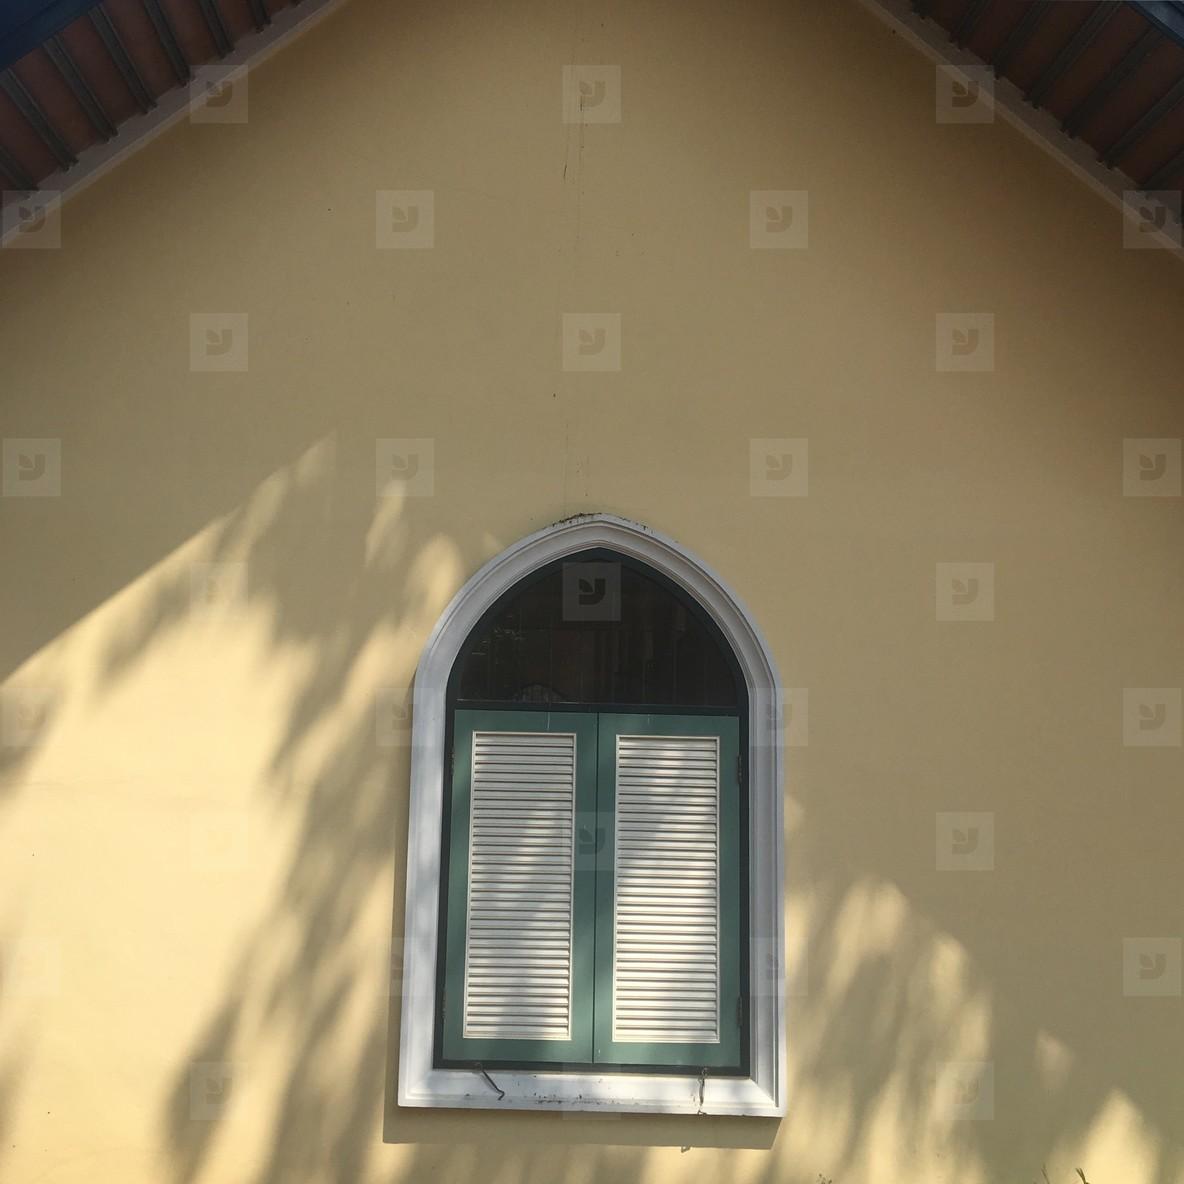 Wooden church window